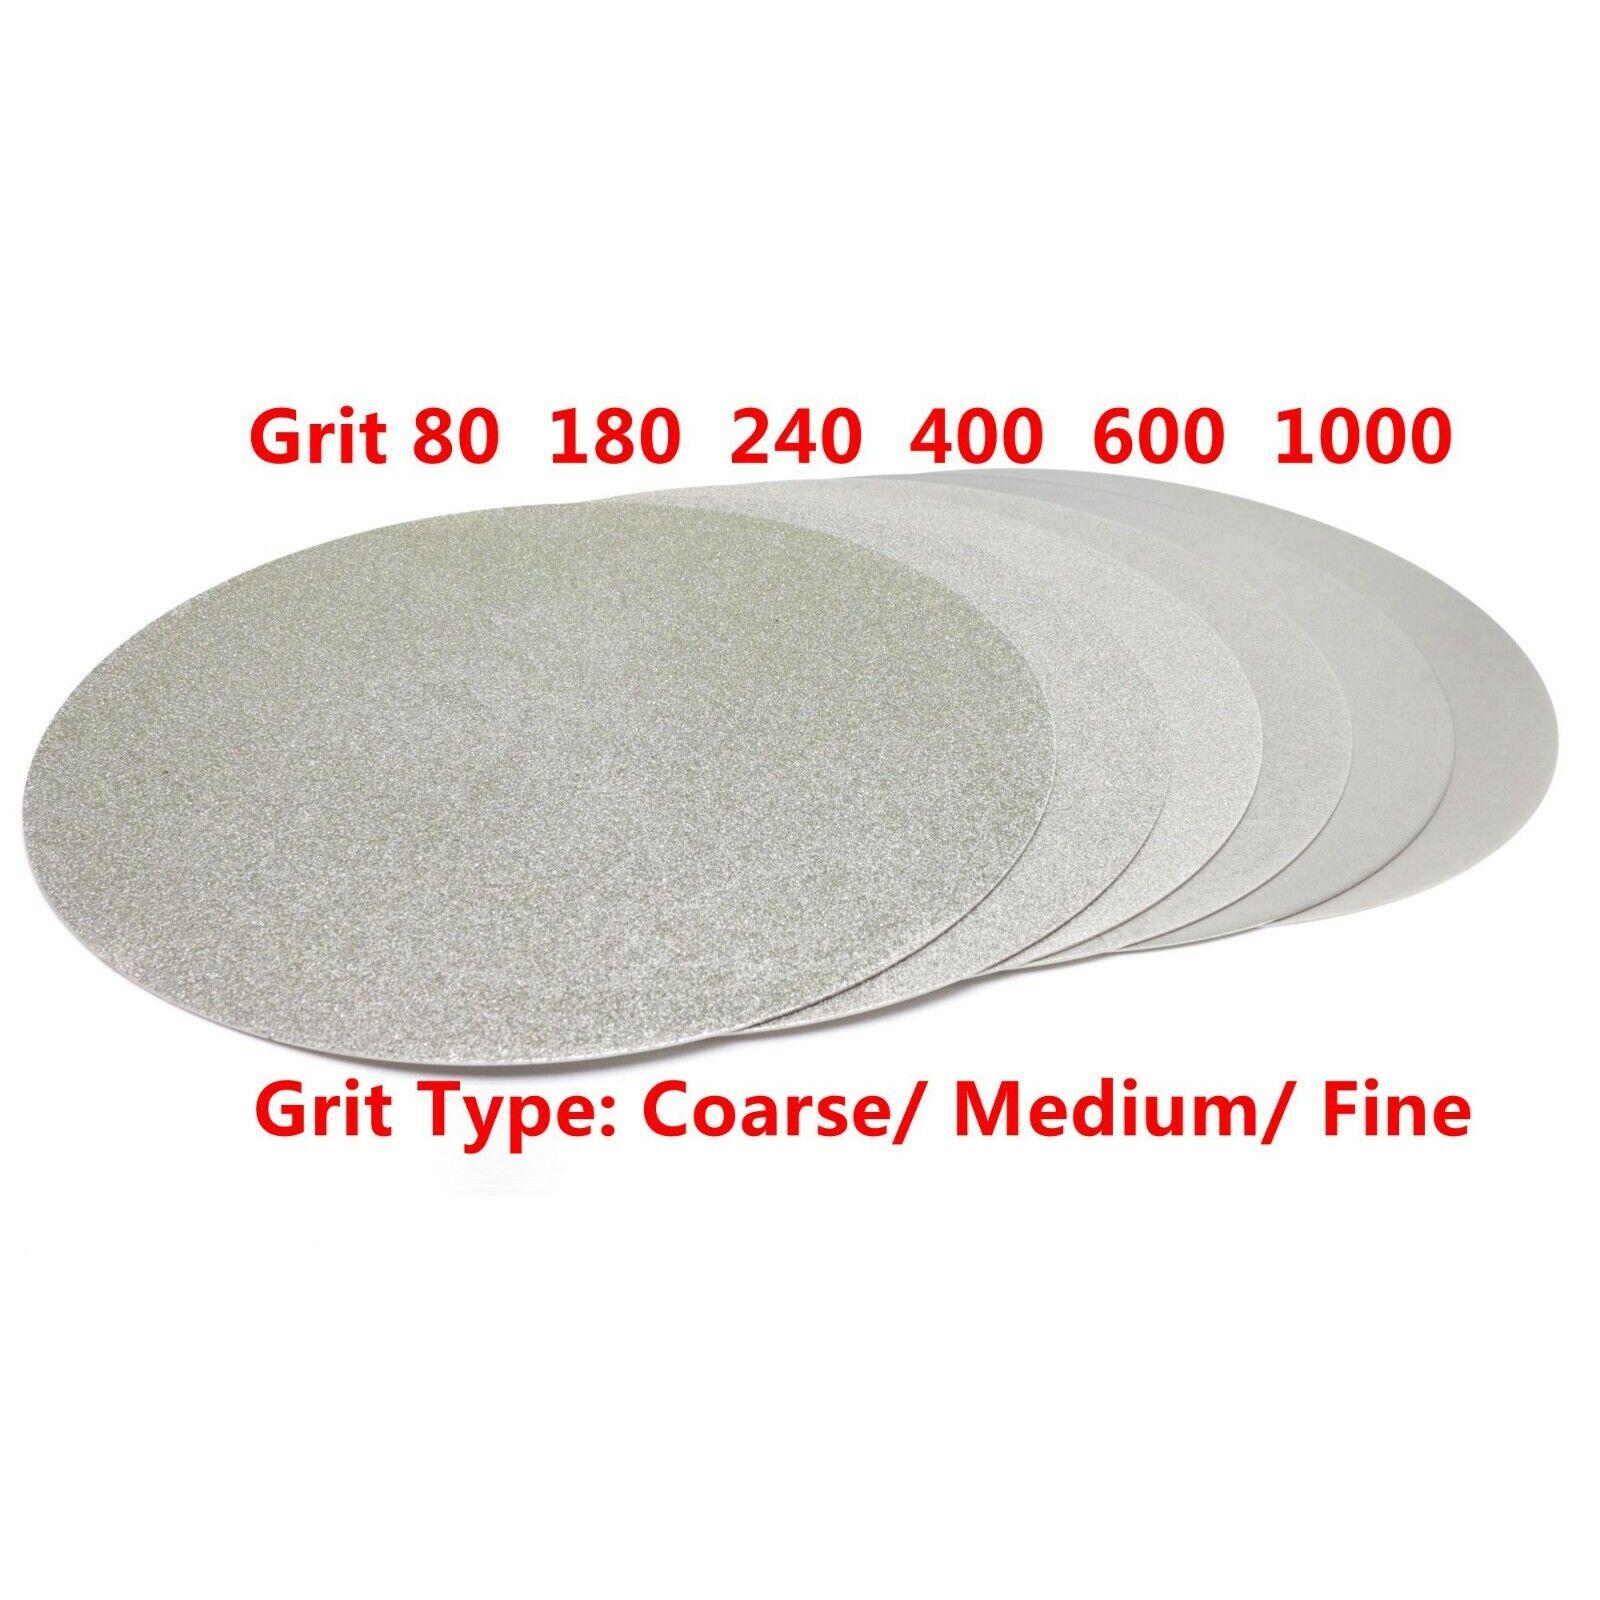 "как выглядит NO CENTER HOLE 8"" inch Grit 80 Diamond Grinding Disc Wheel Coated Flat Lap Disk фото"